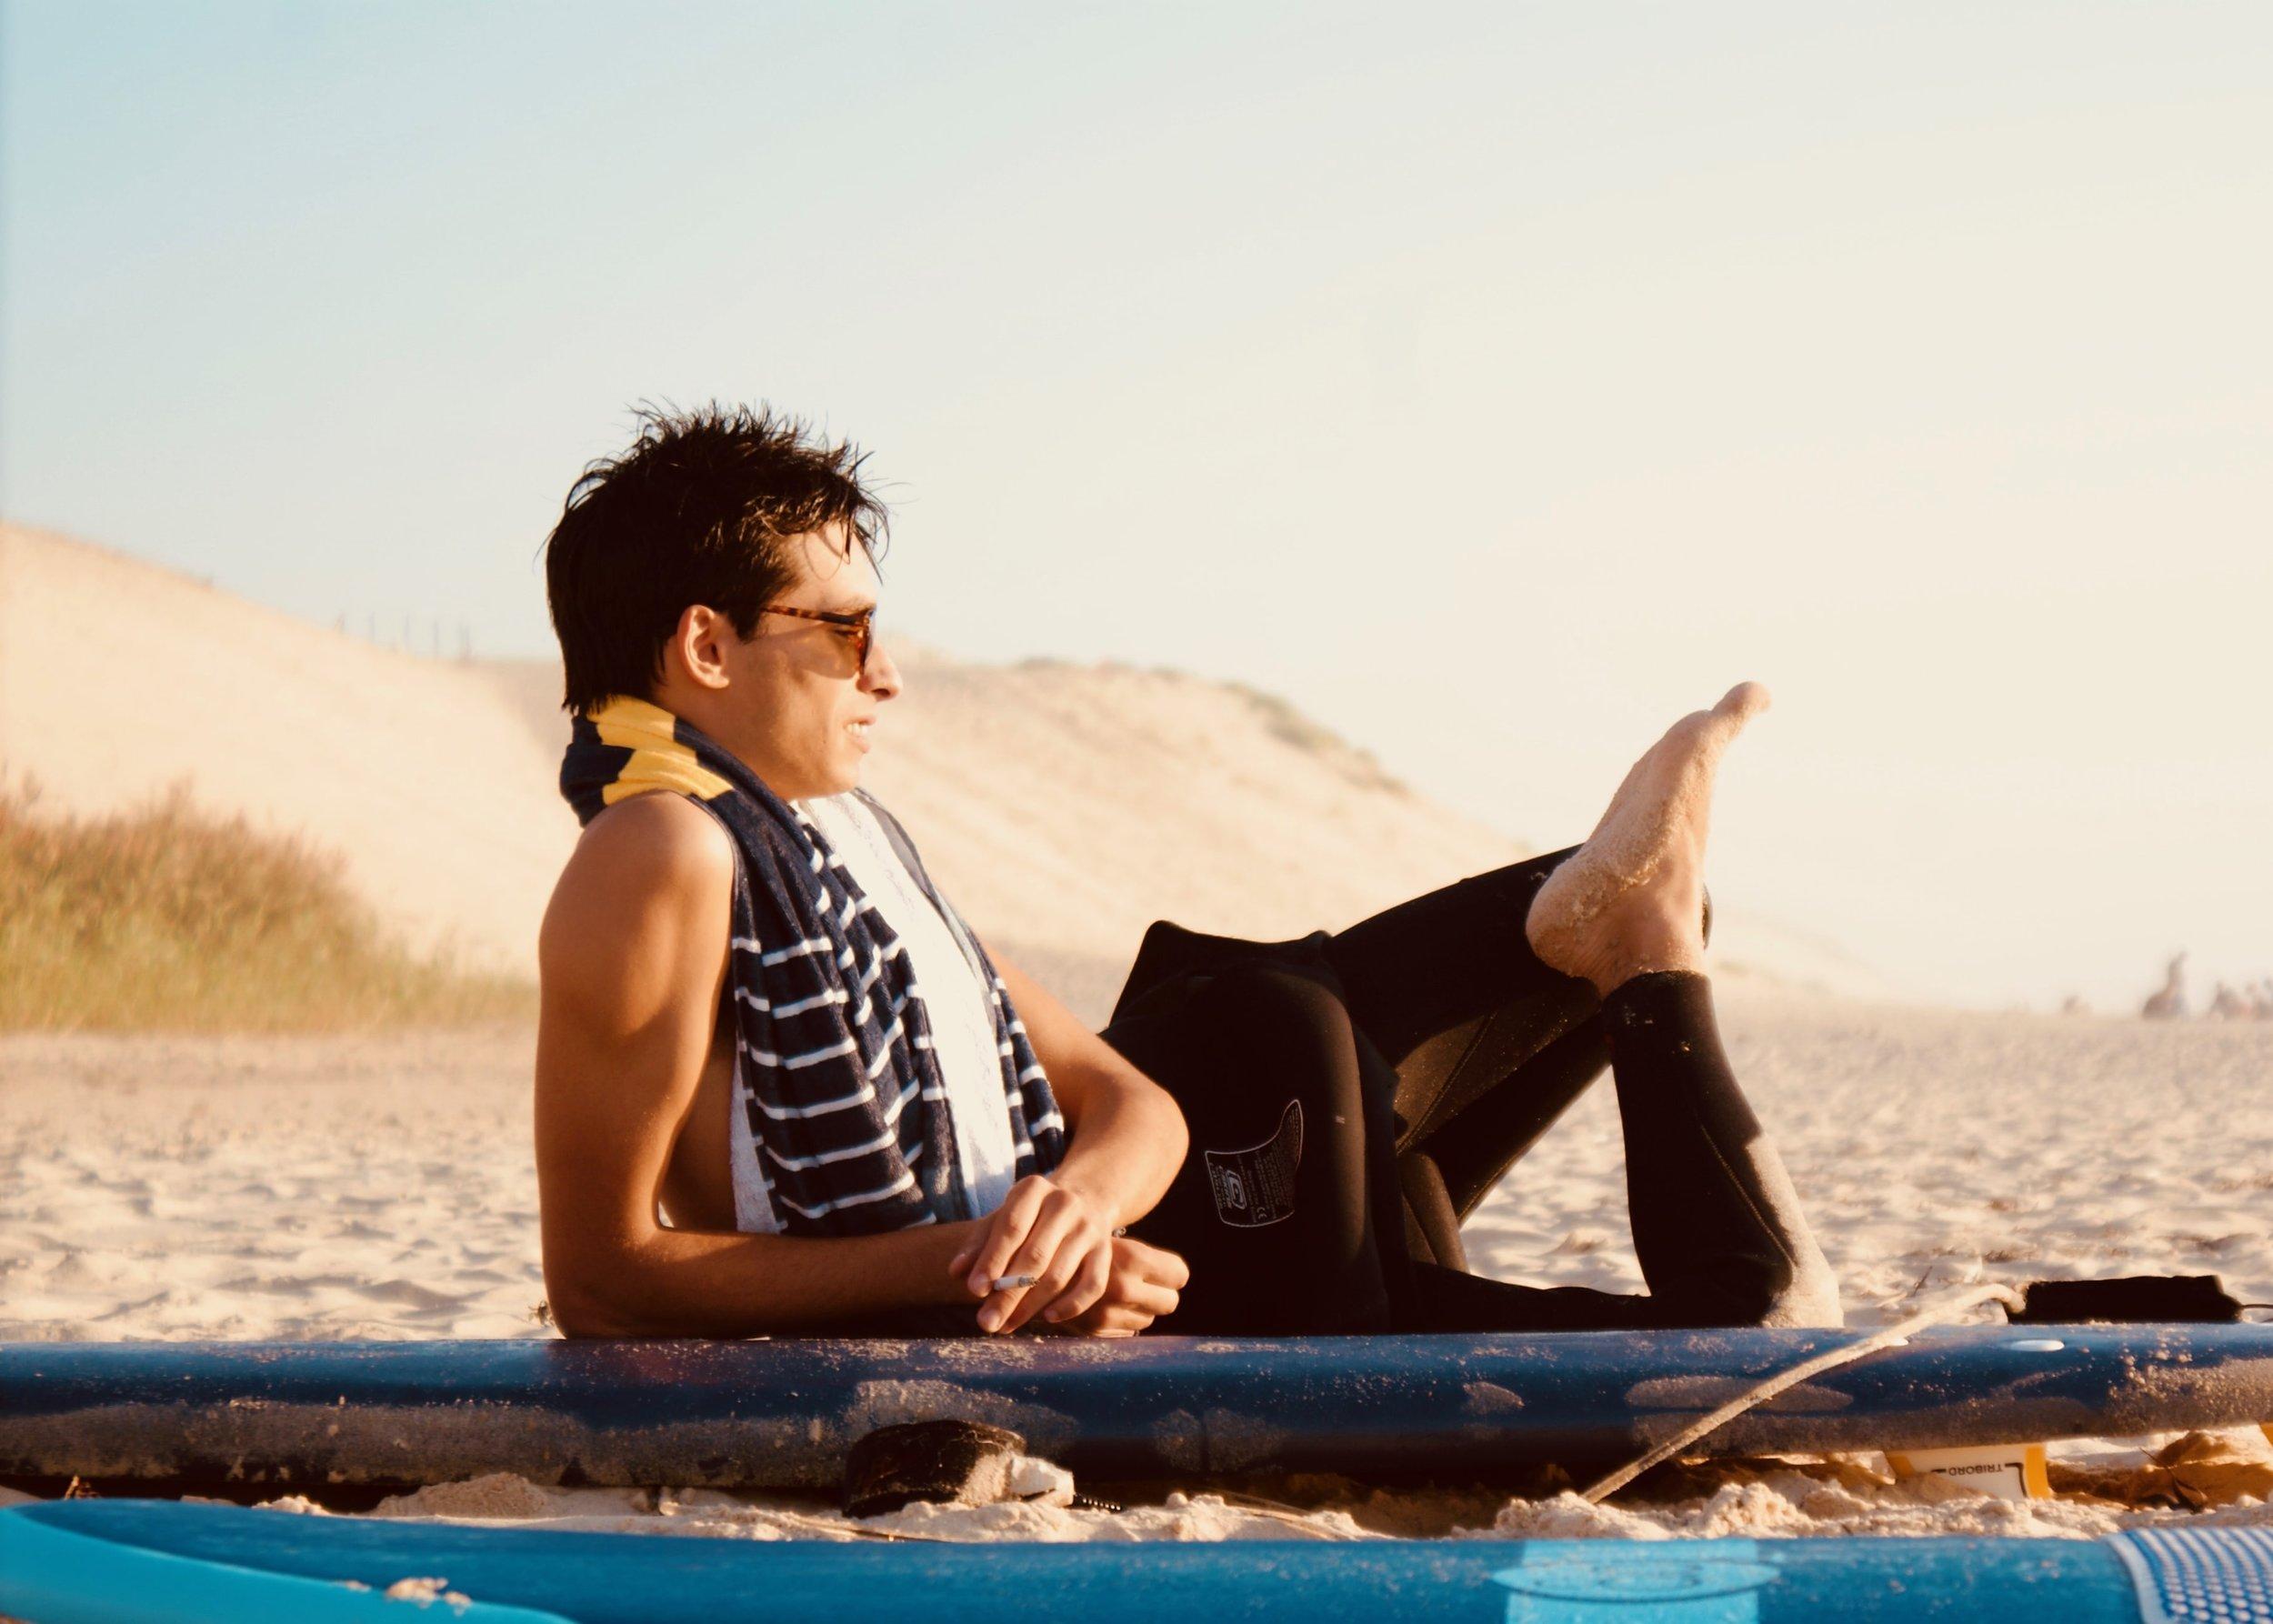 leo model beach chill sanctuary surf holiday-min.jpg